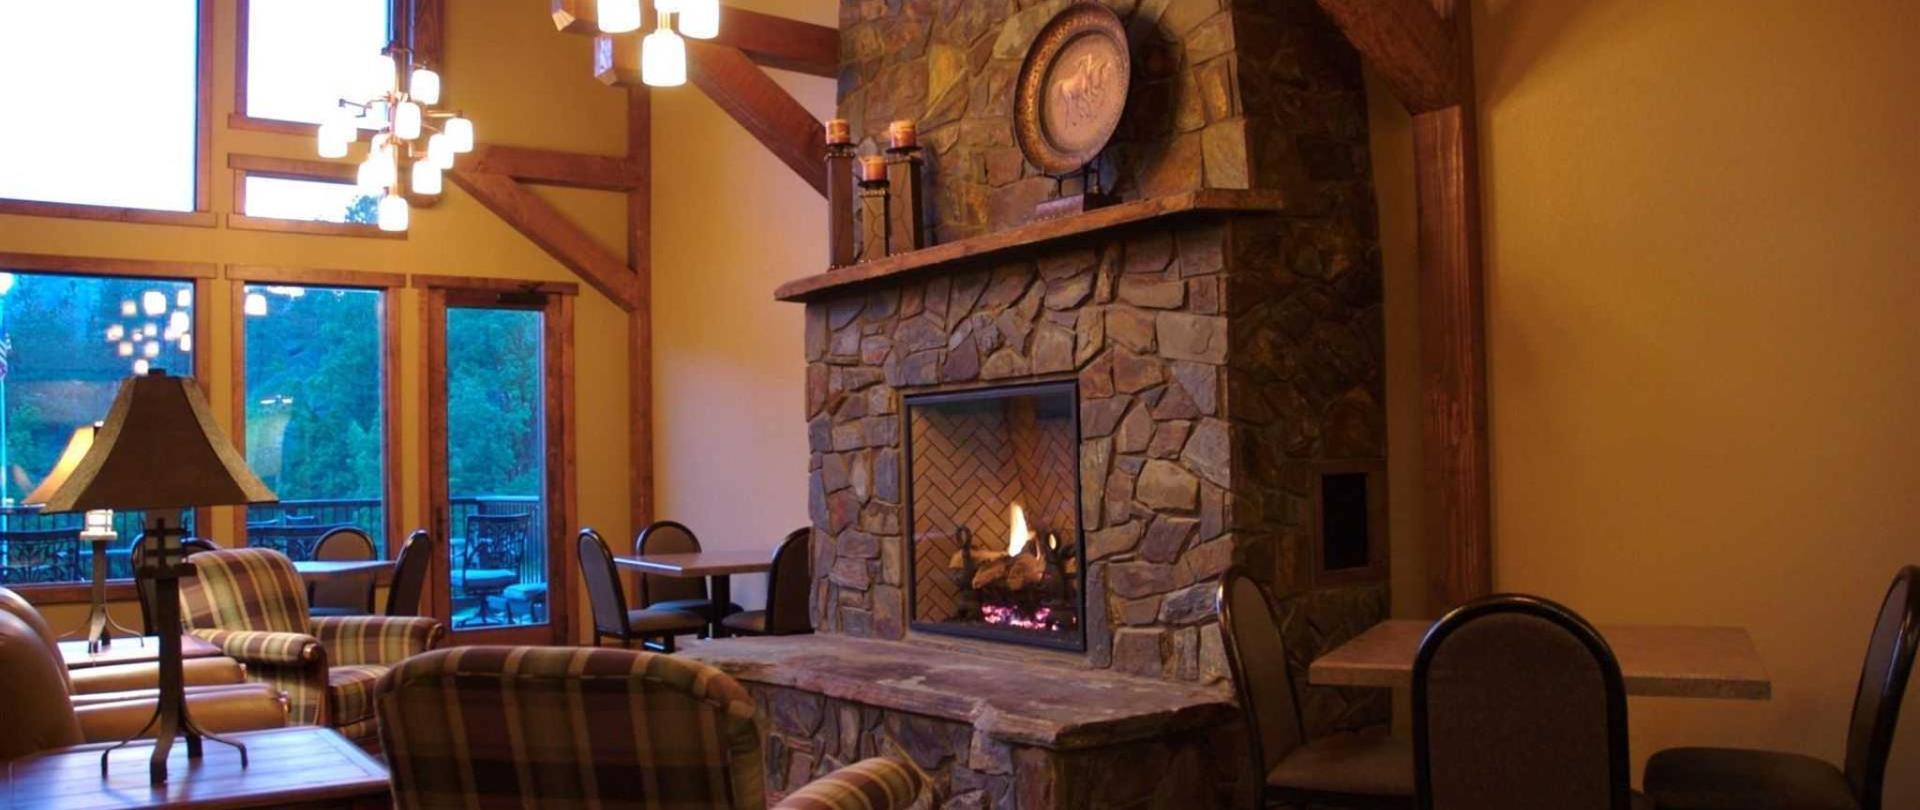 k-bar-s-lodge-lobby-and-fireplace.jpg.1920x0.jpg